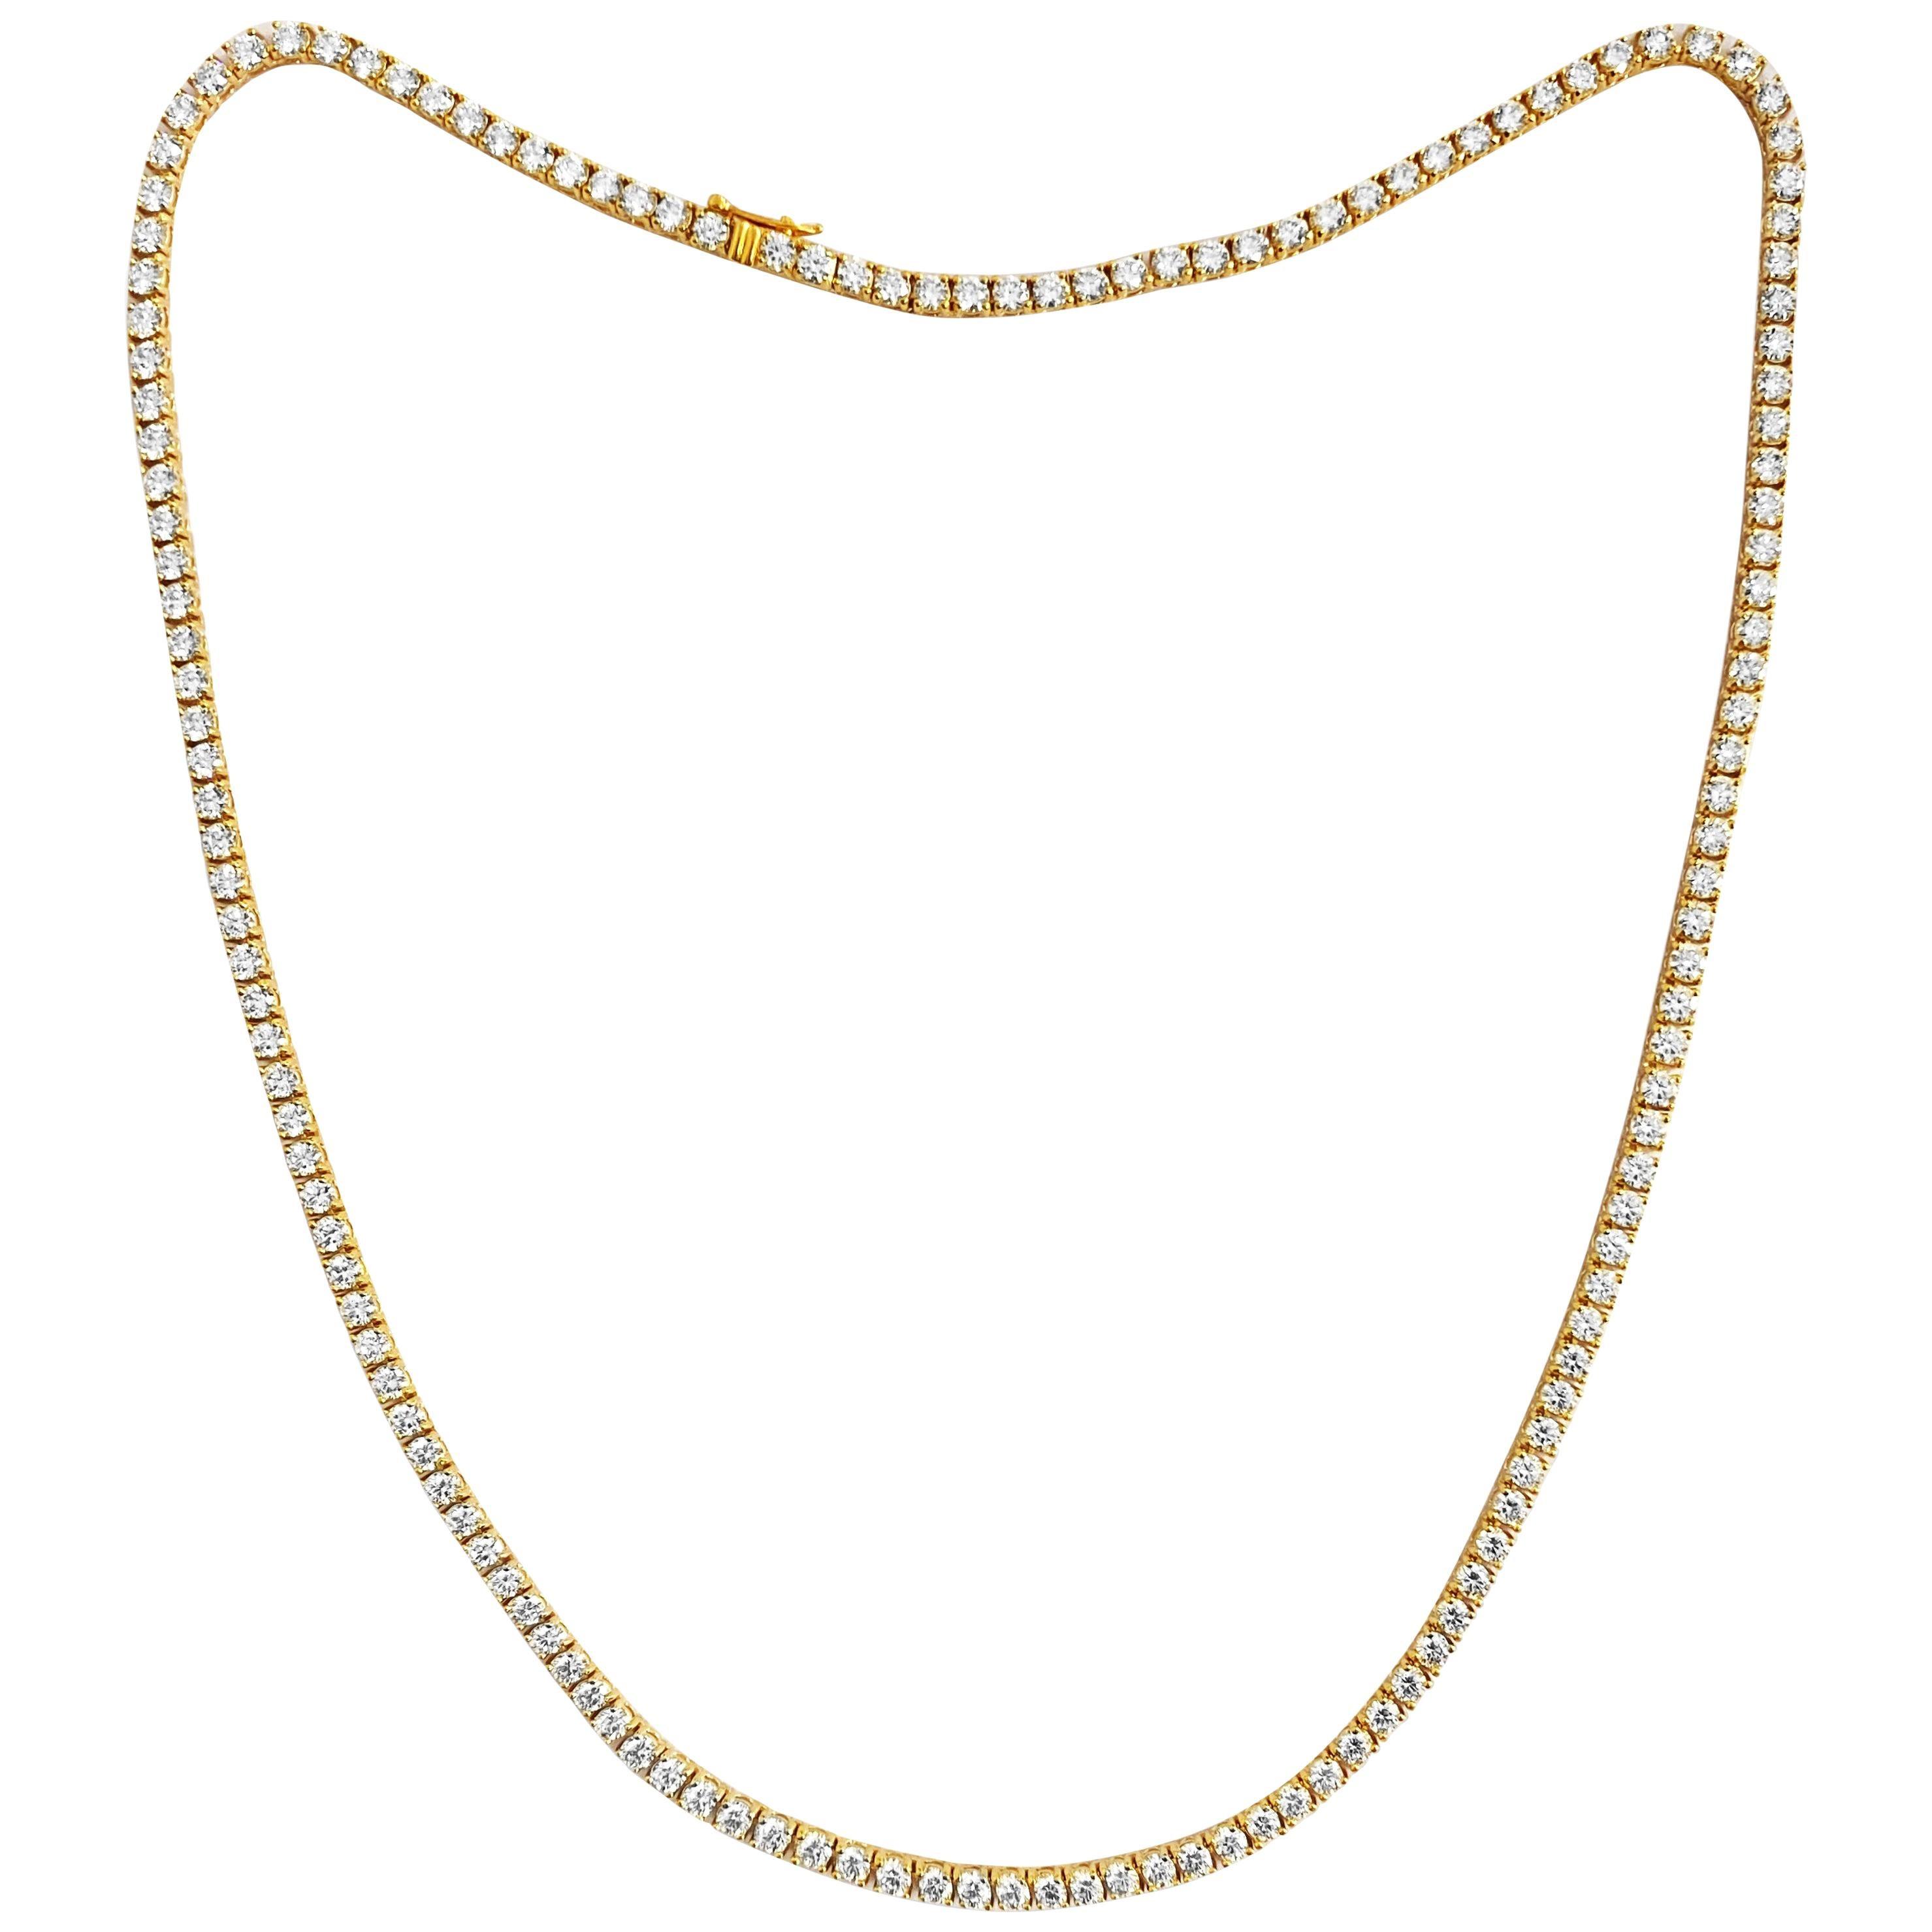 Unisex 14.50 Carat VVS Diamond Tennis Necklace 14 Karat Yellow Gold